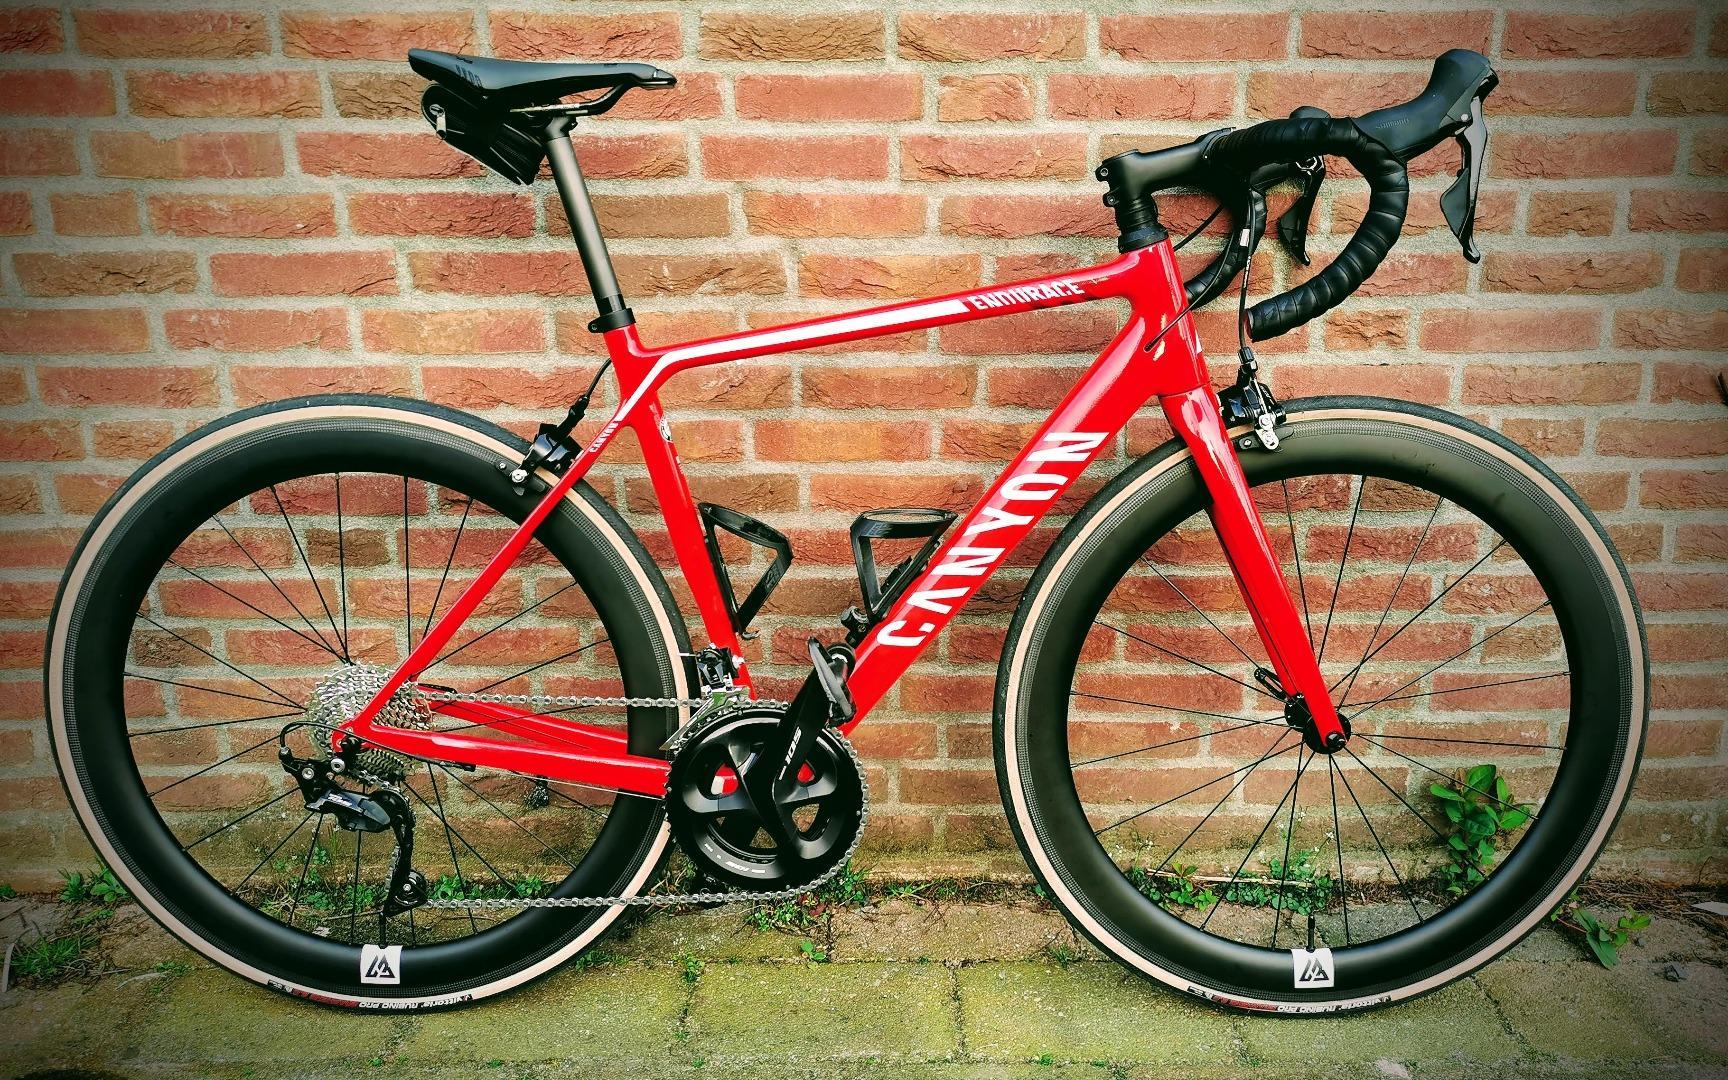 Canyon-Endurace-CF-7.0-on-light-bicycle-r55-carbon-wheelset